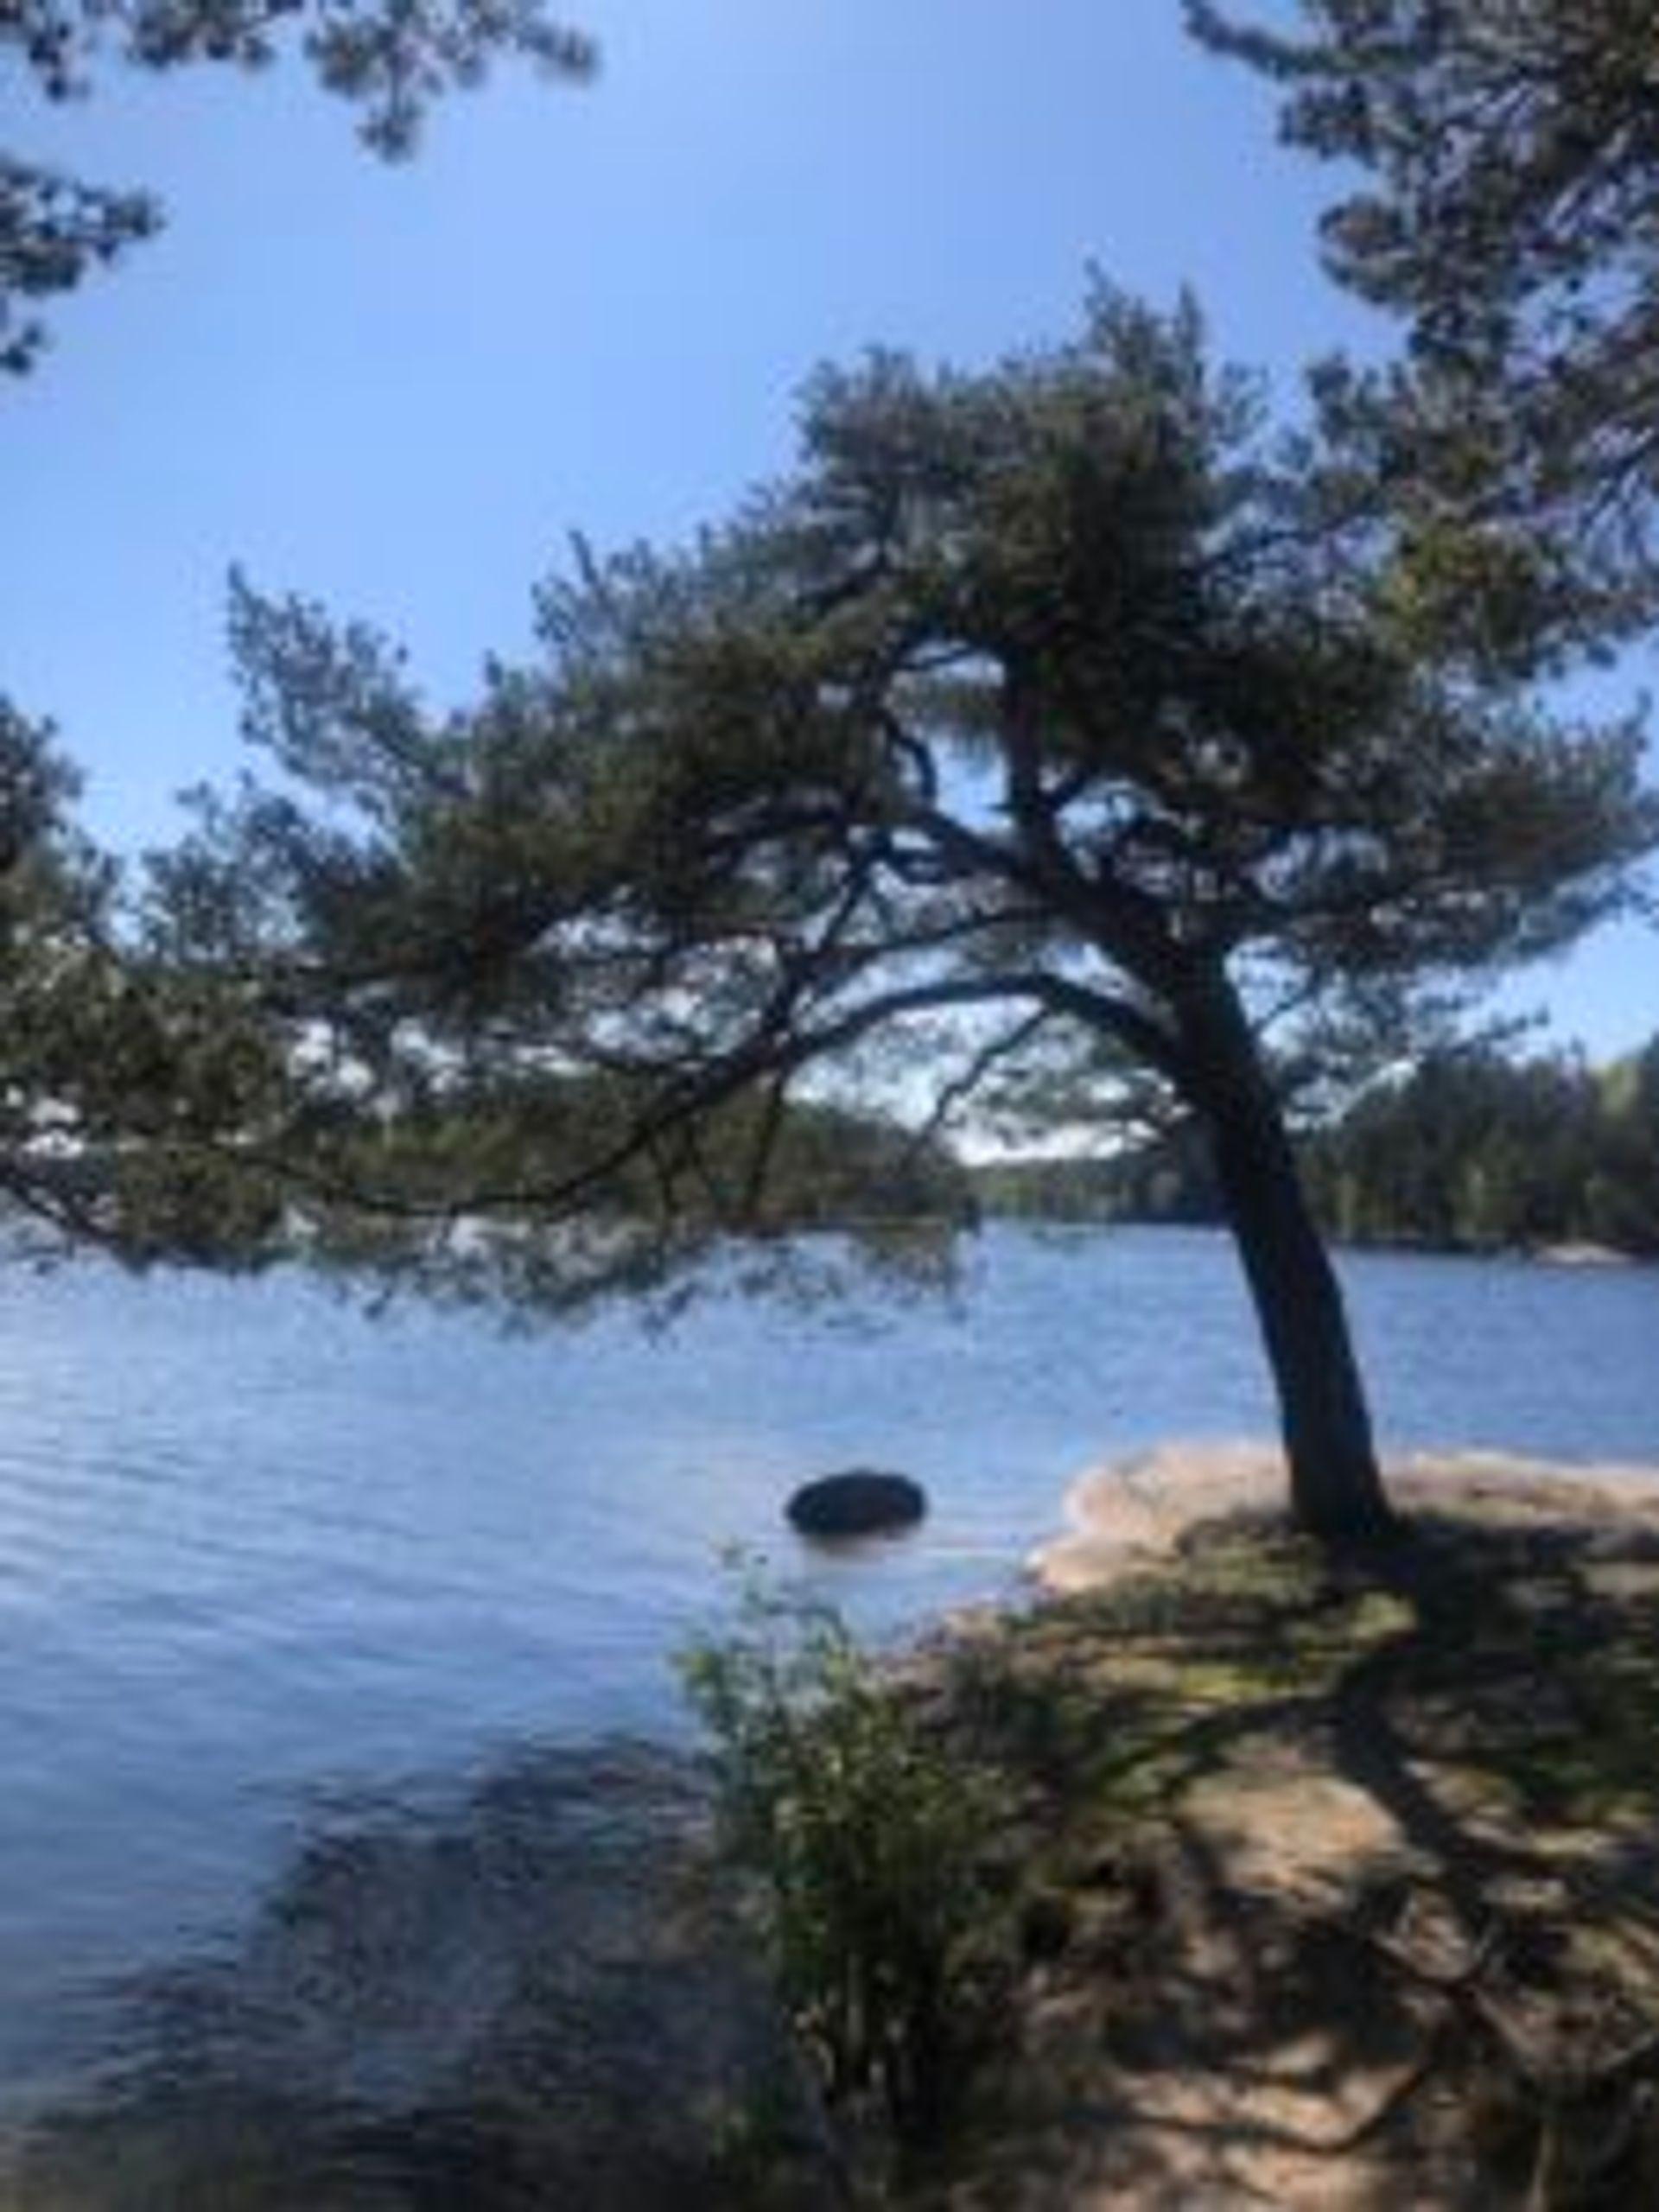 A tree beside the lake.